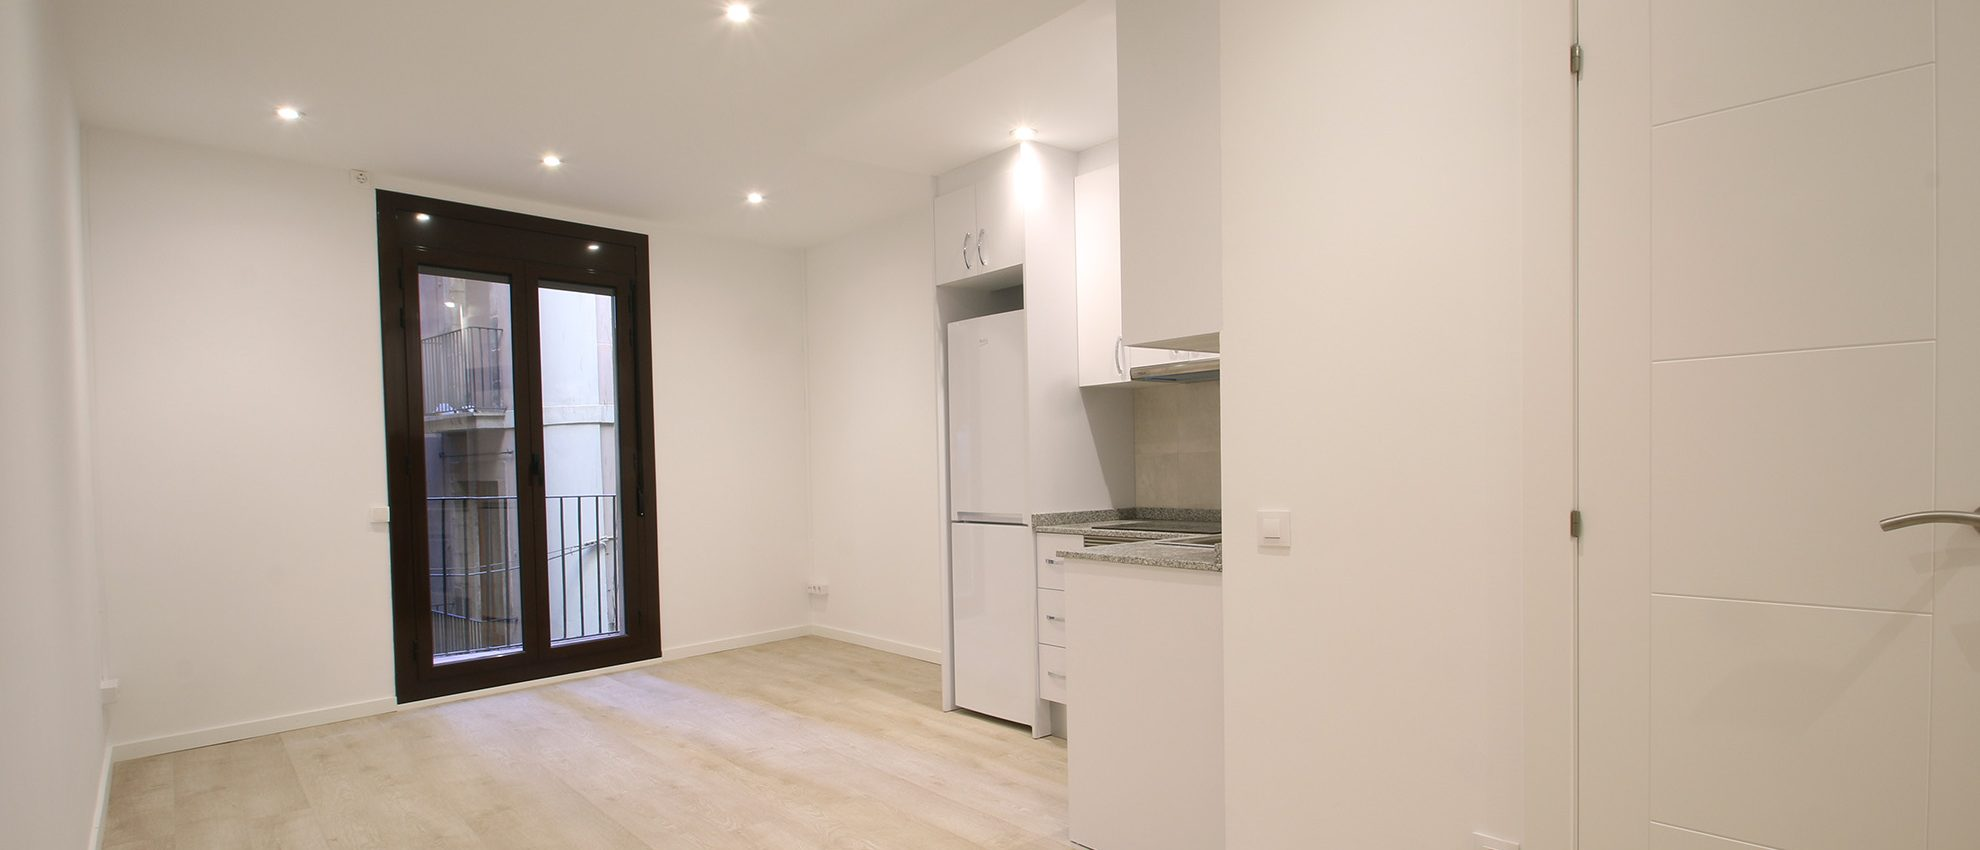 Escudellers 4 apartment